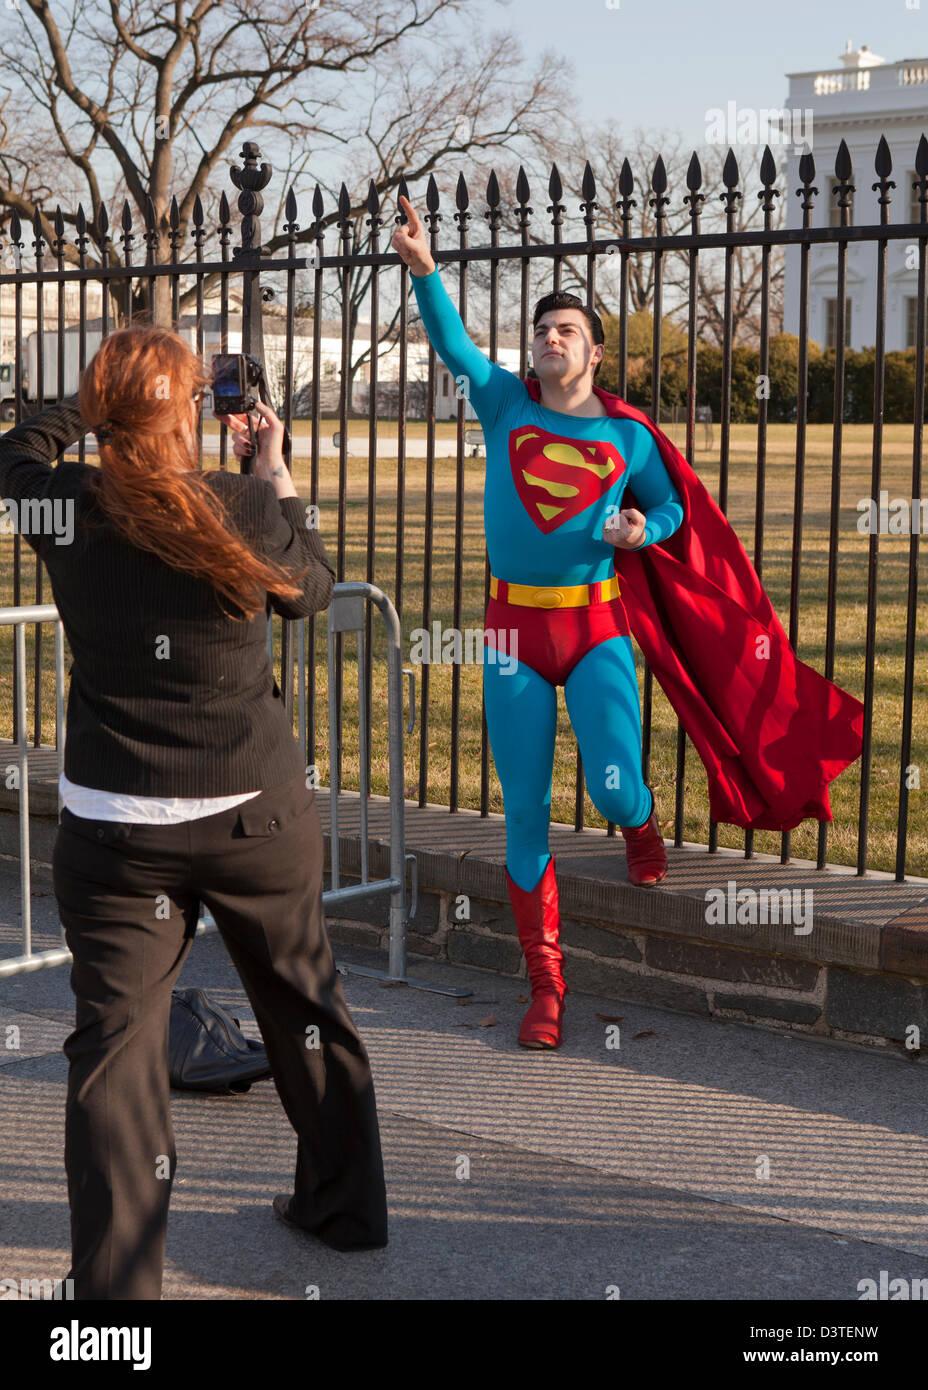 Hombre en traje superman Imagen De Stock